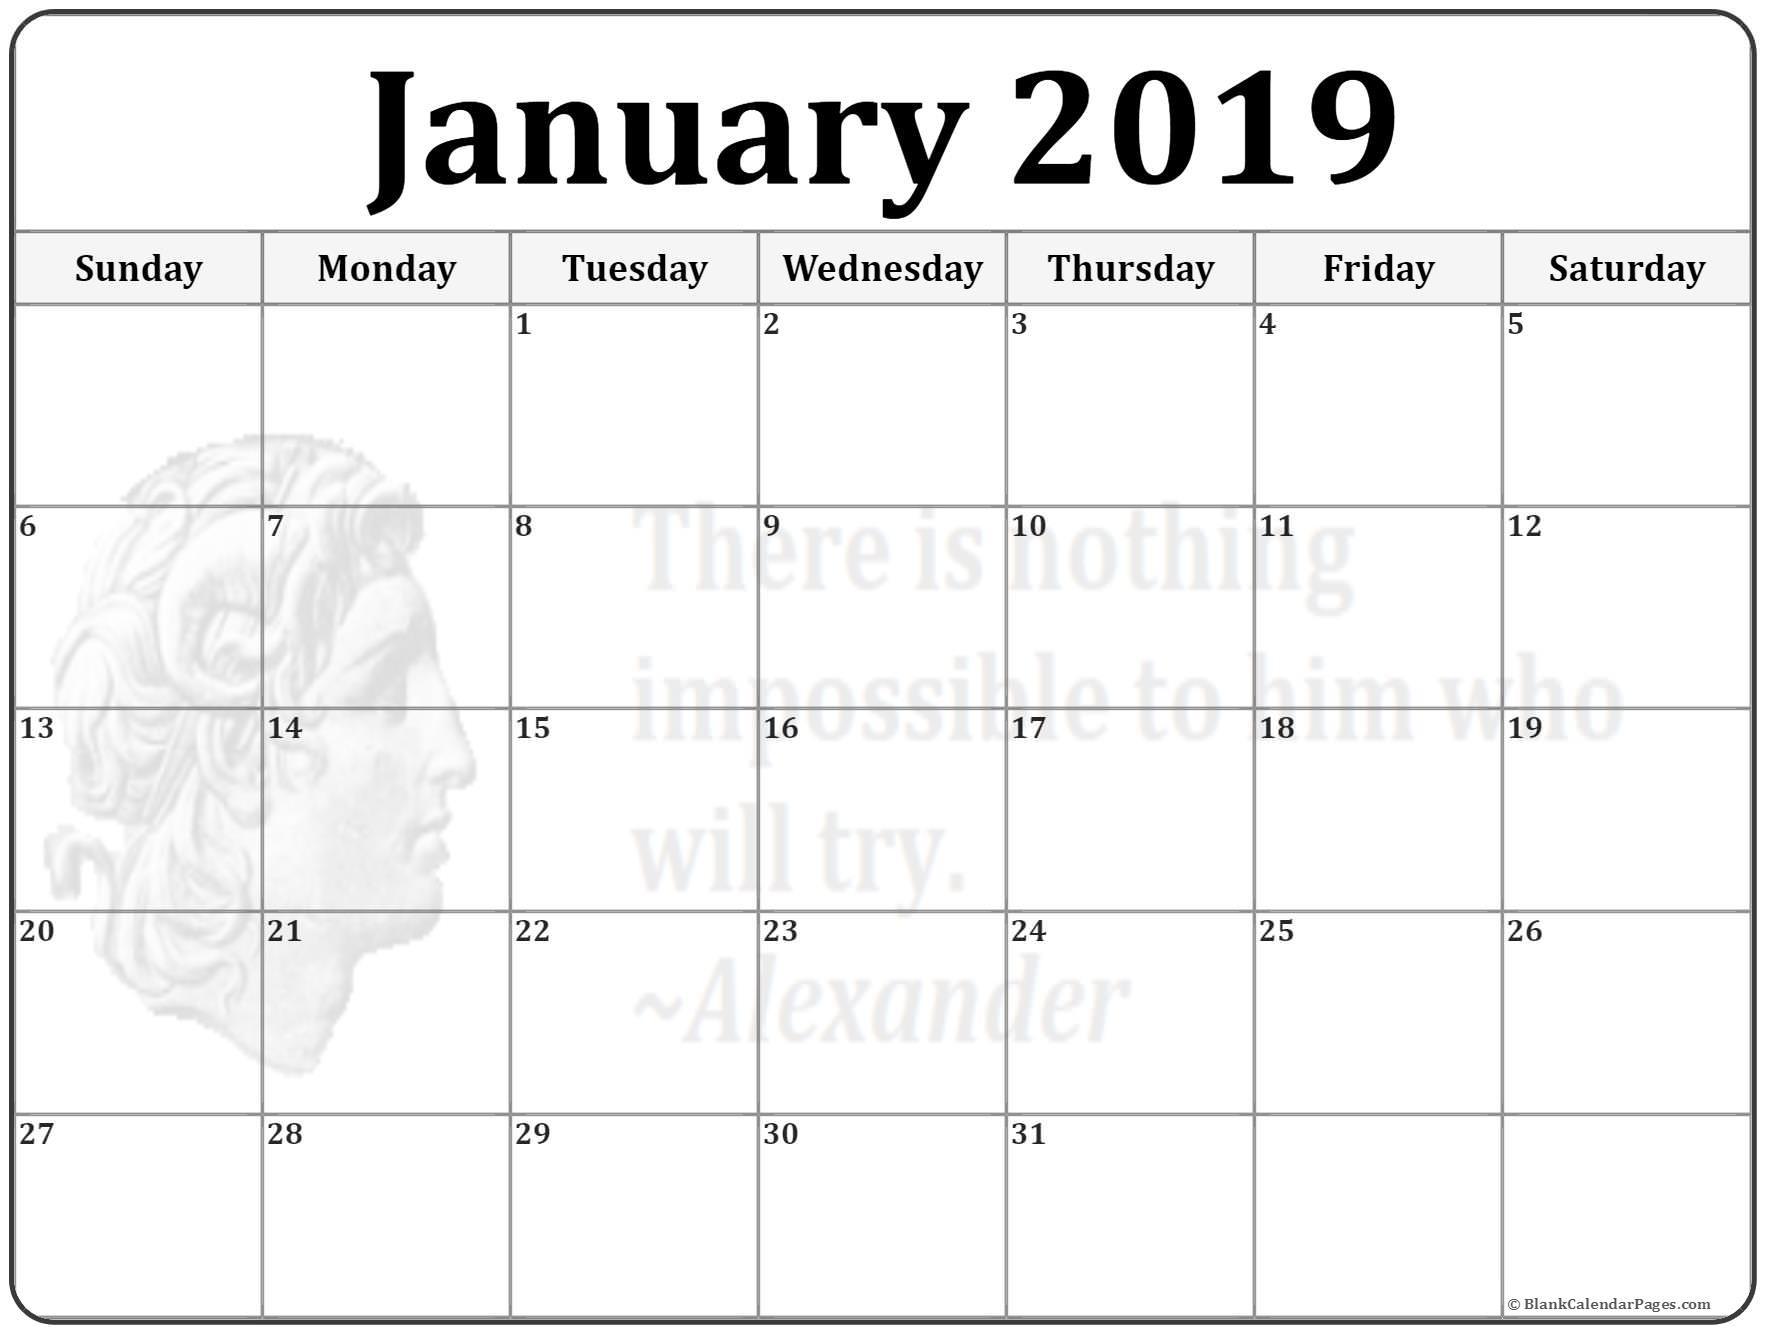 Jan 2019 Calendar Printable January 2019 Calendar